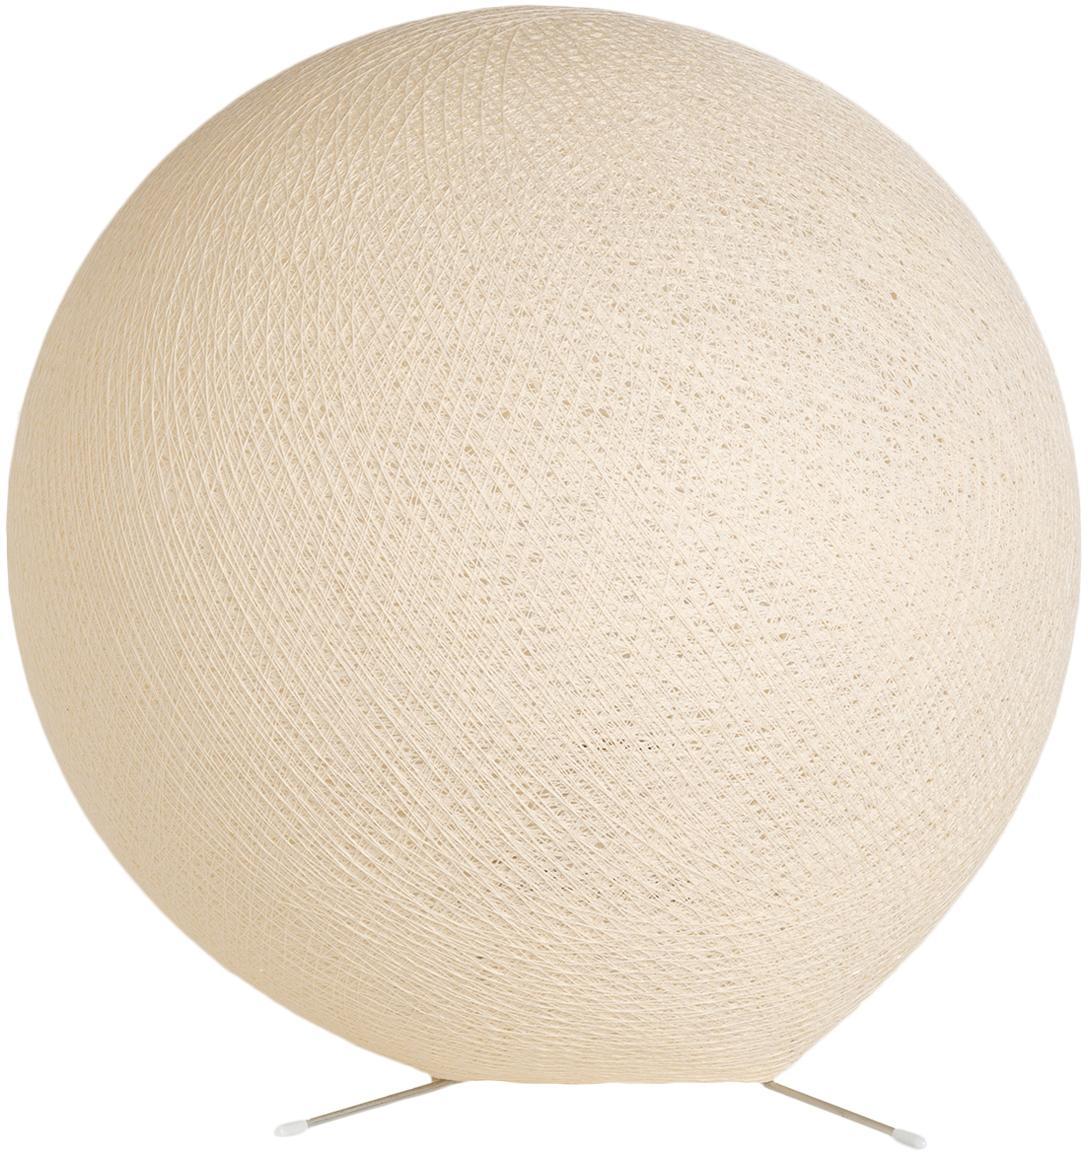 Lampa stołowa Colorain, Beżowy, Ø 36 cm